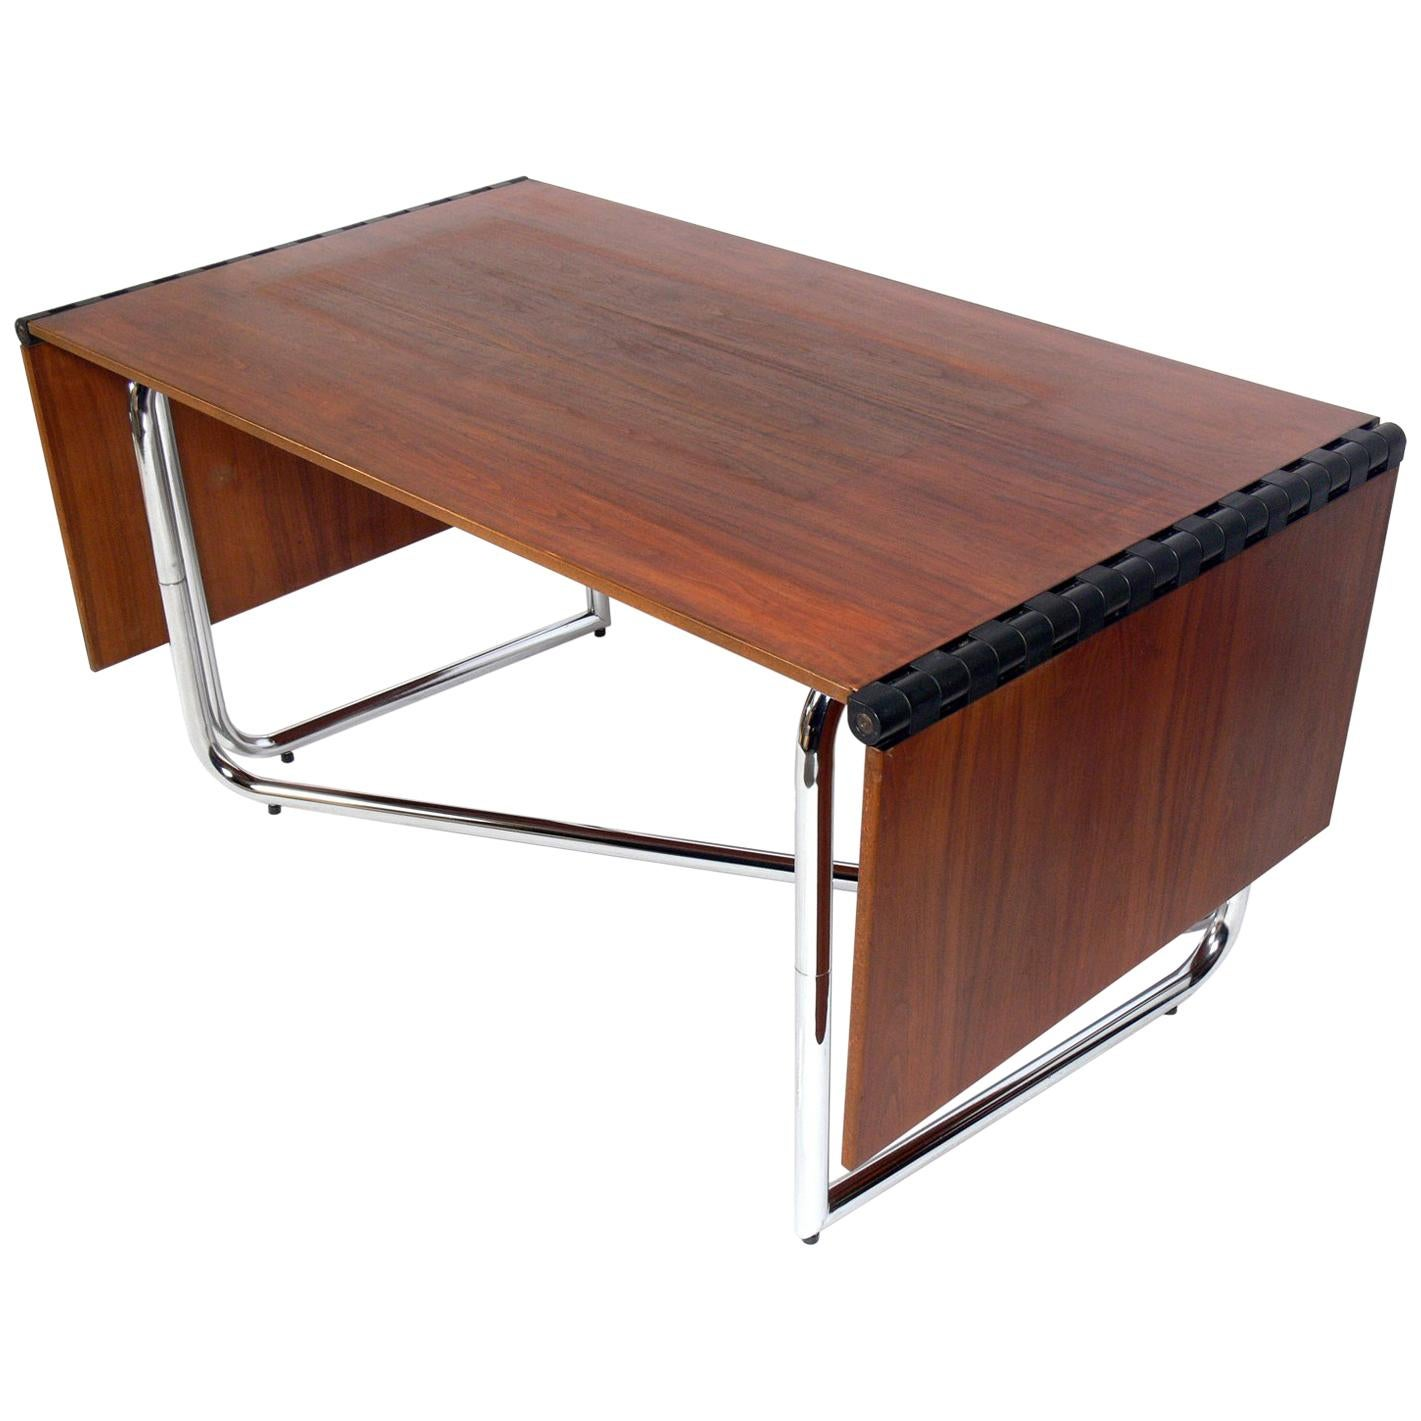 1970s Italian Drop Leaf Dining Table or Desk